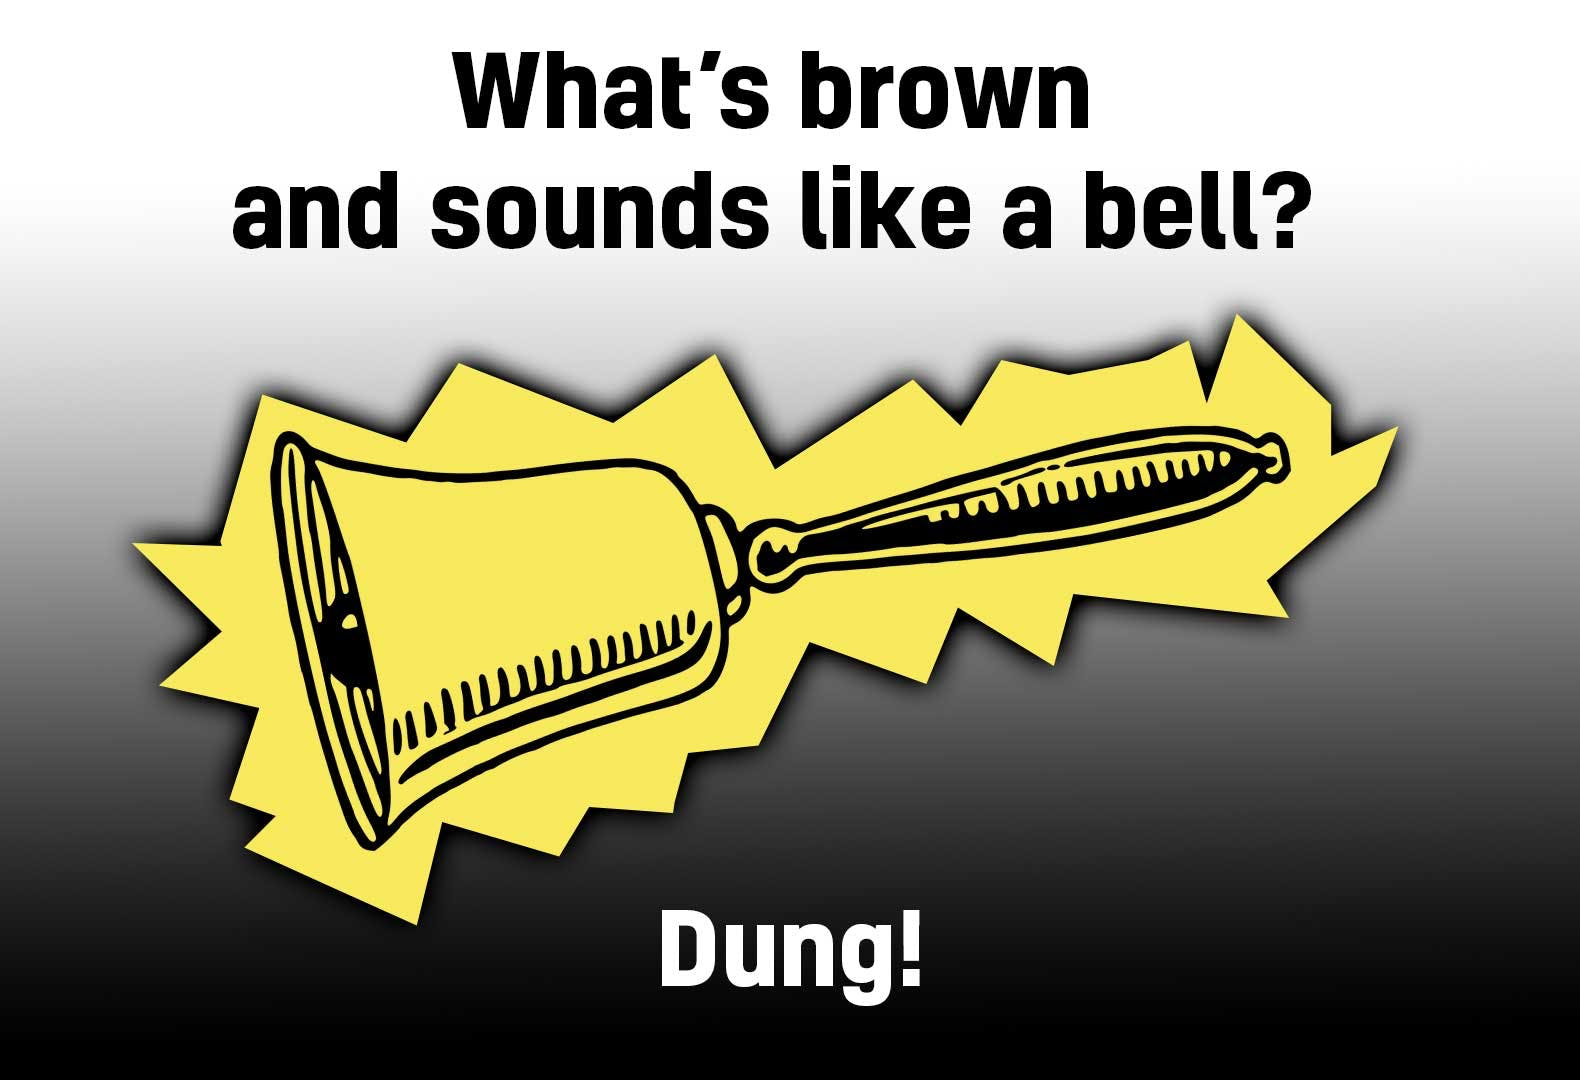 Gross bell joke!